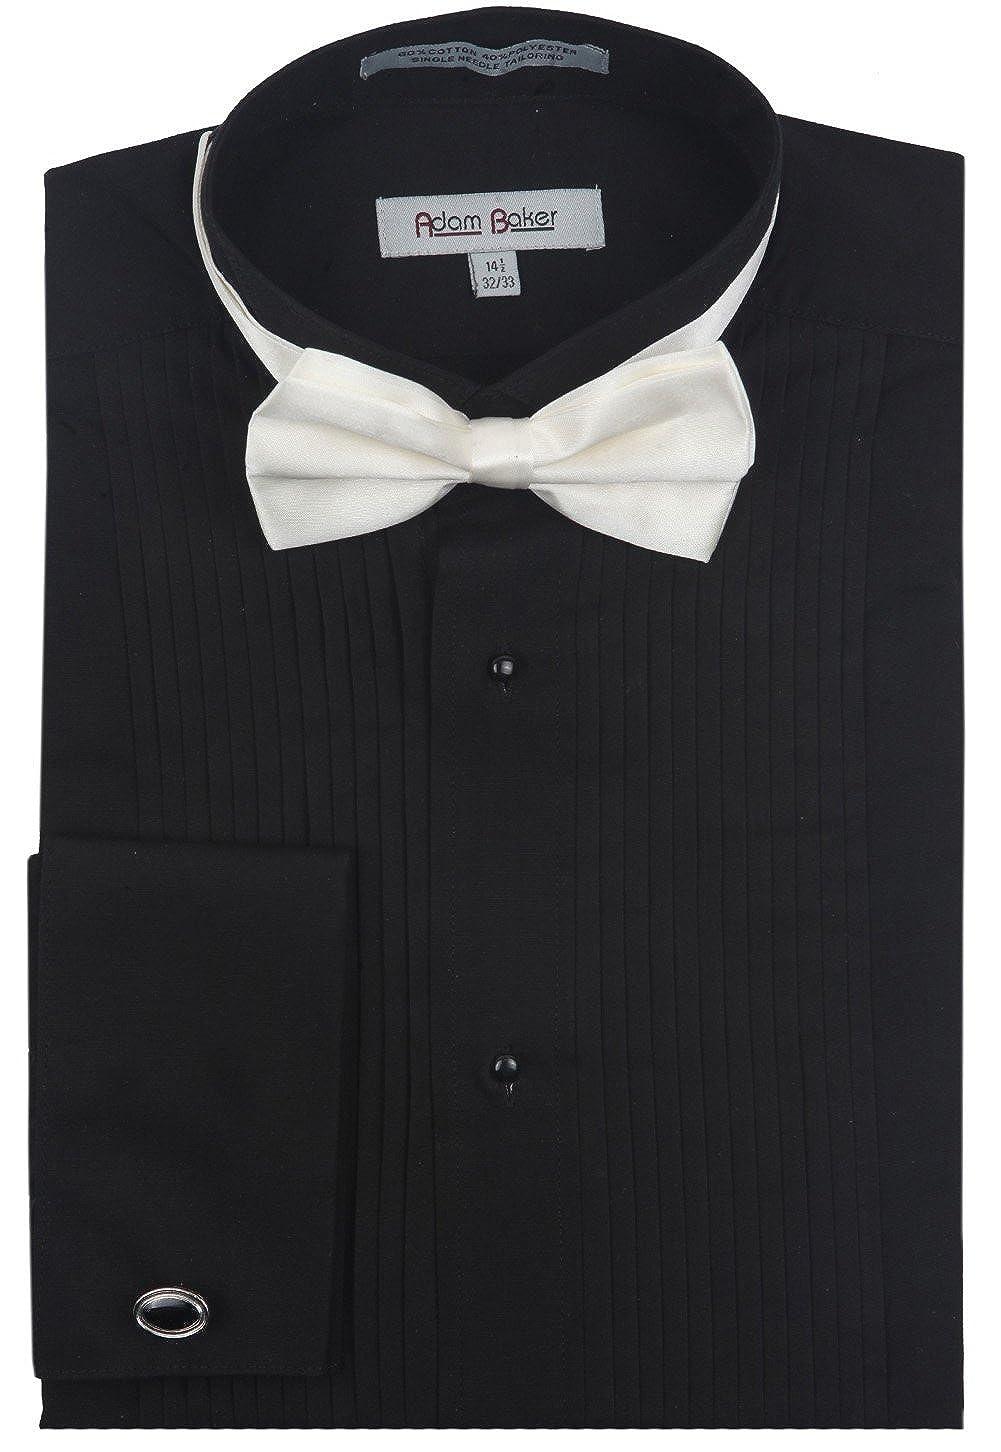 Bowtie /& Cufflinks Included Adam Baker Men/'s Regular Fit Wingtip Collar French Cuff Formal Tuxedo Shirt 1922